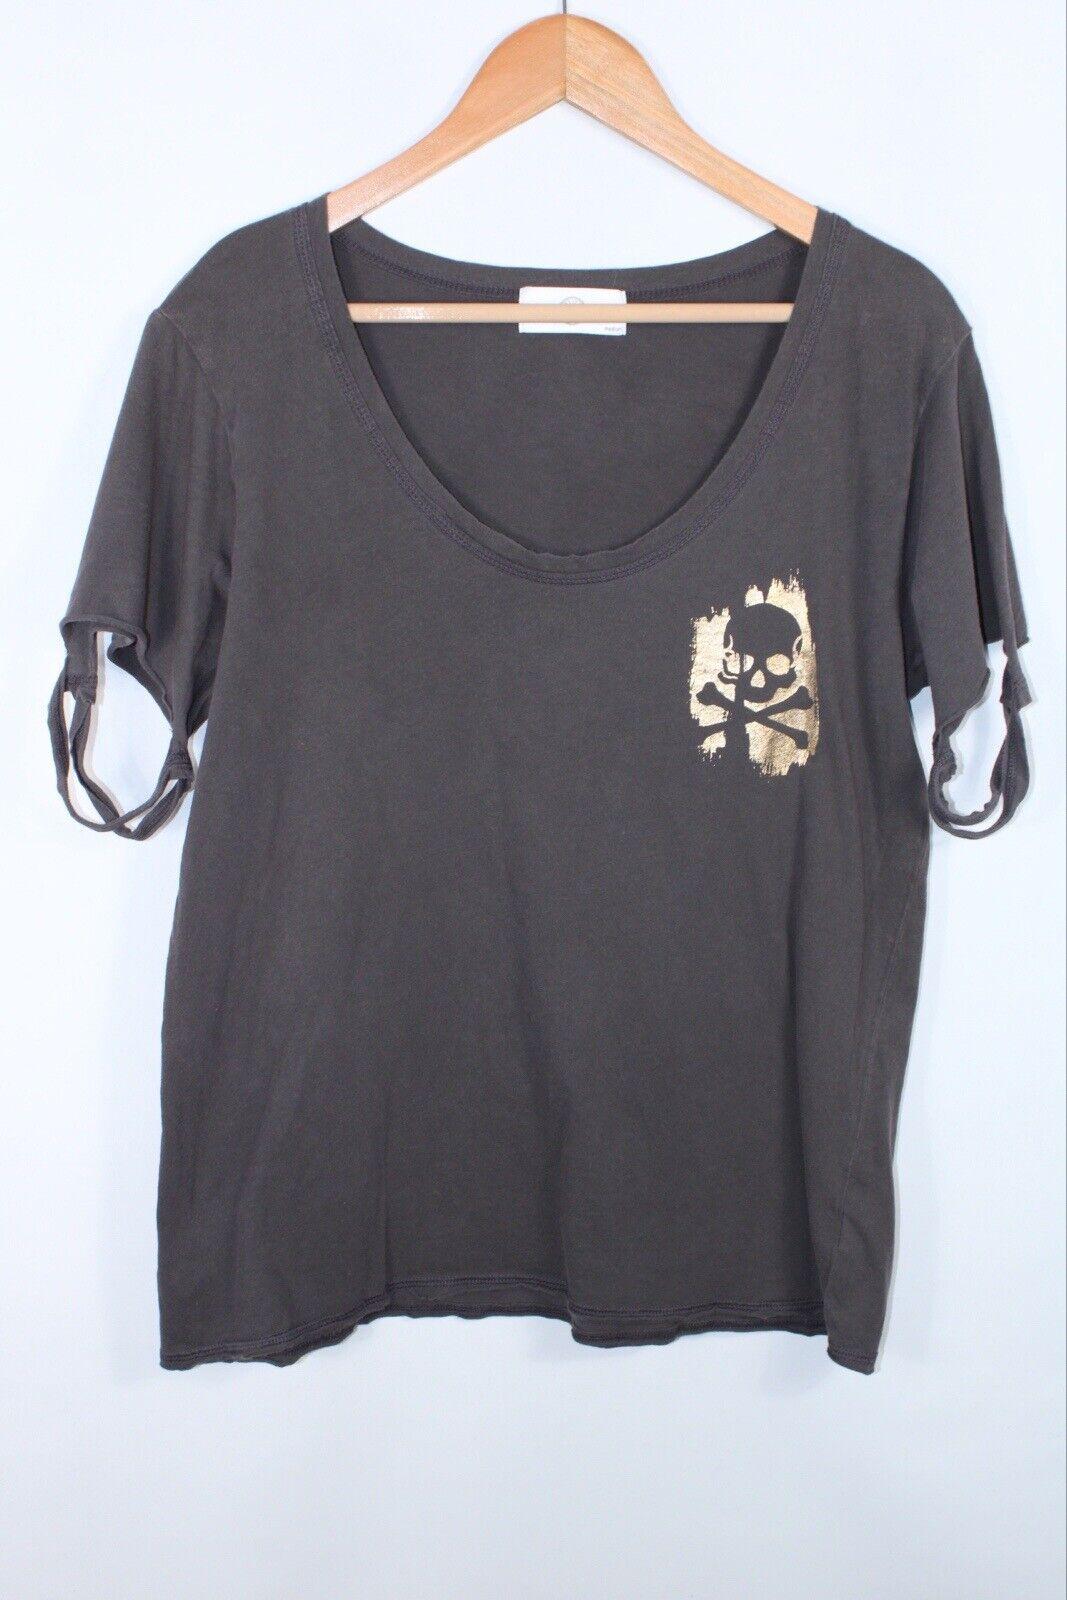 Soulcycle Women's Medium Gray Gold Short Sleeve T-Shirt